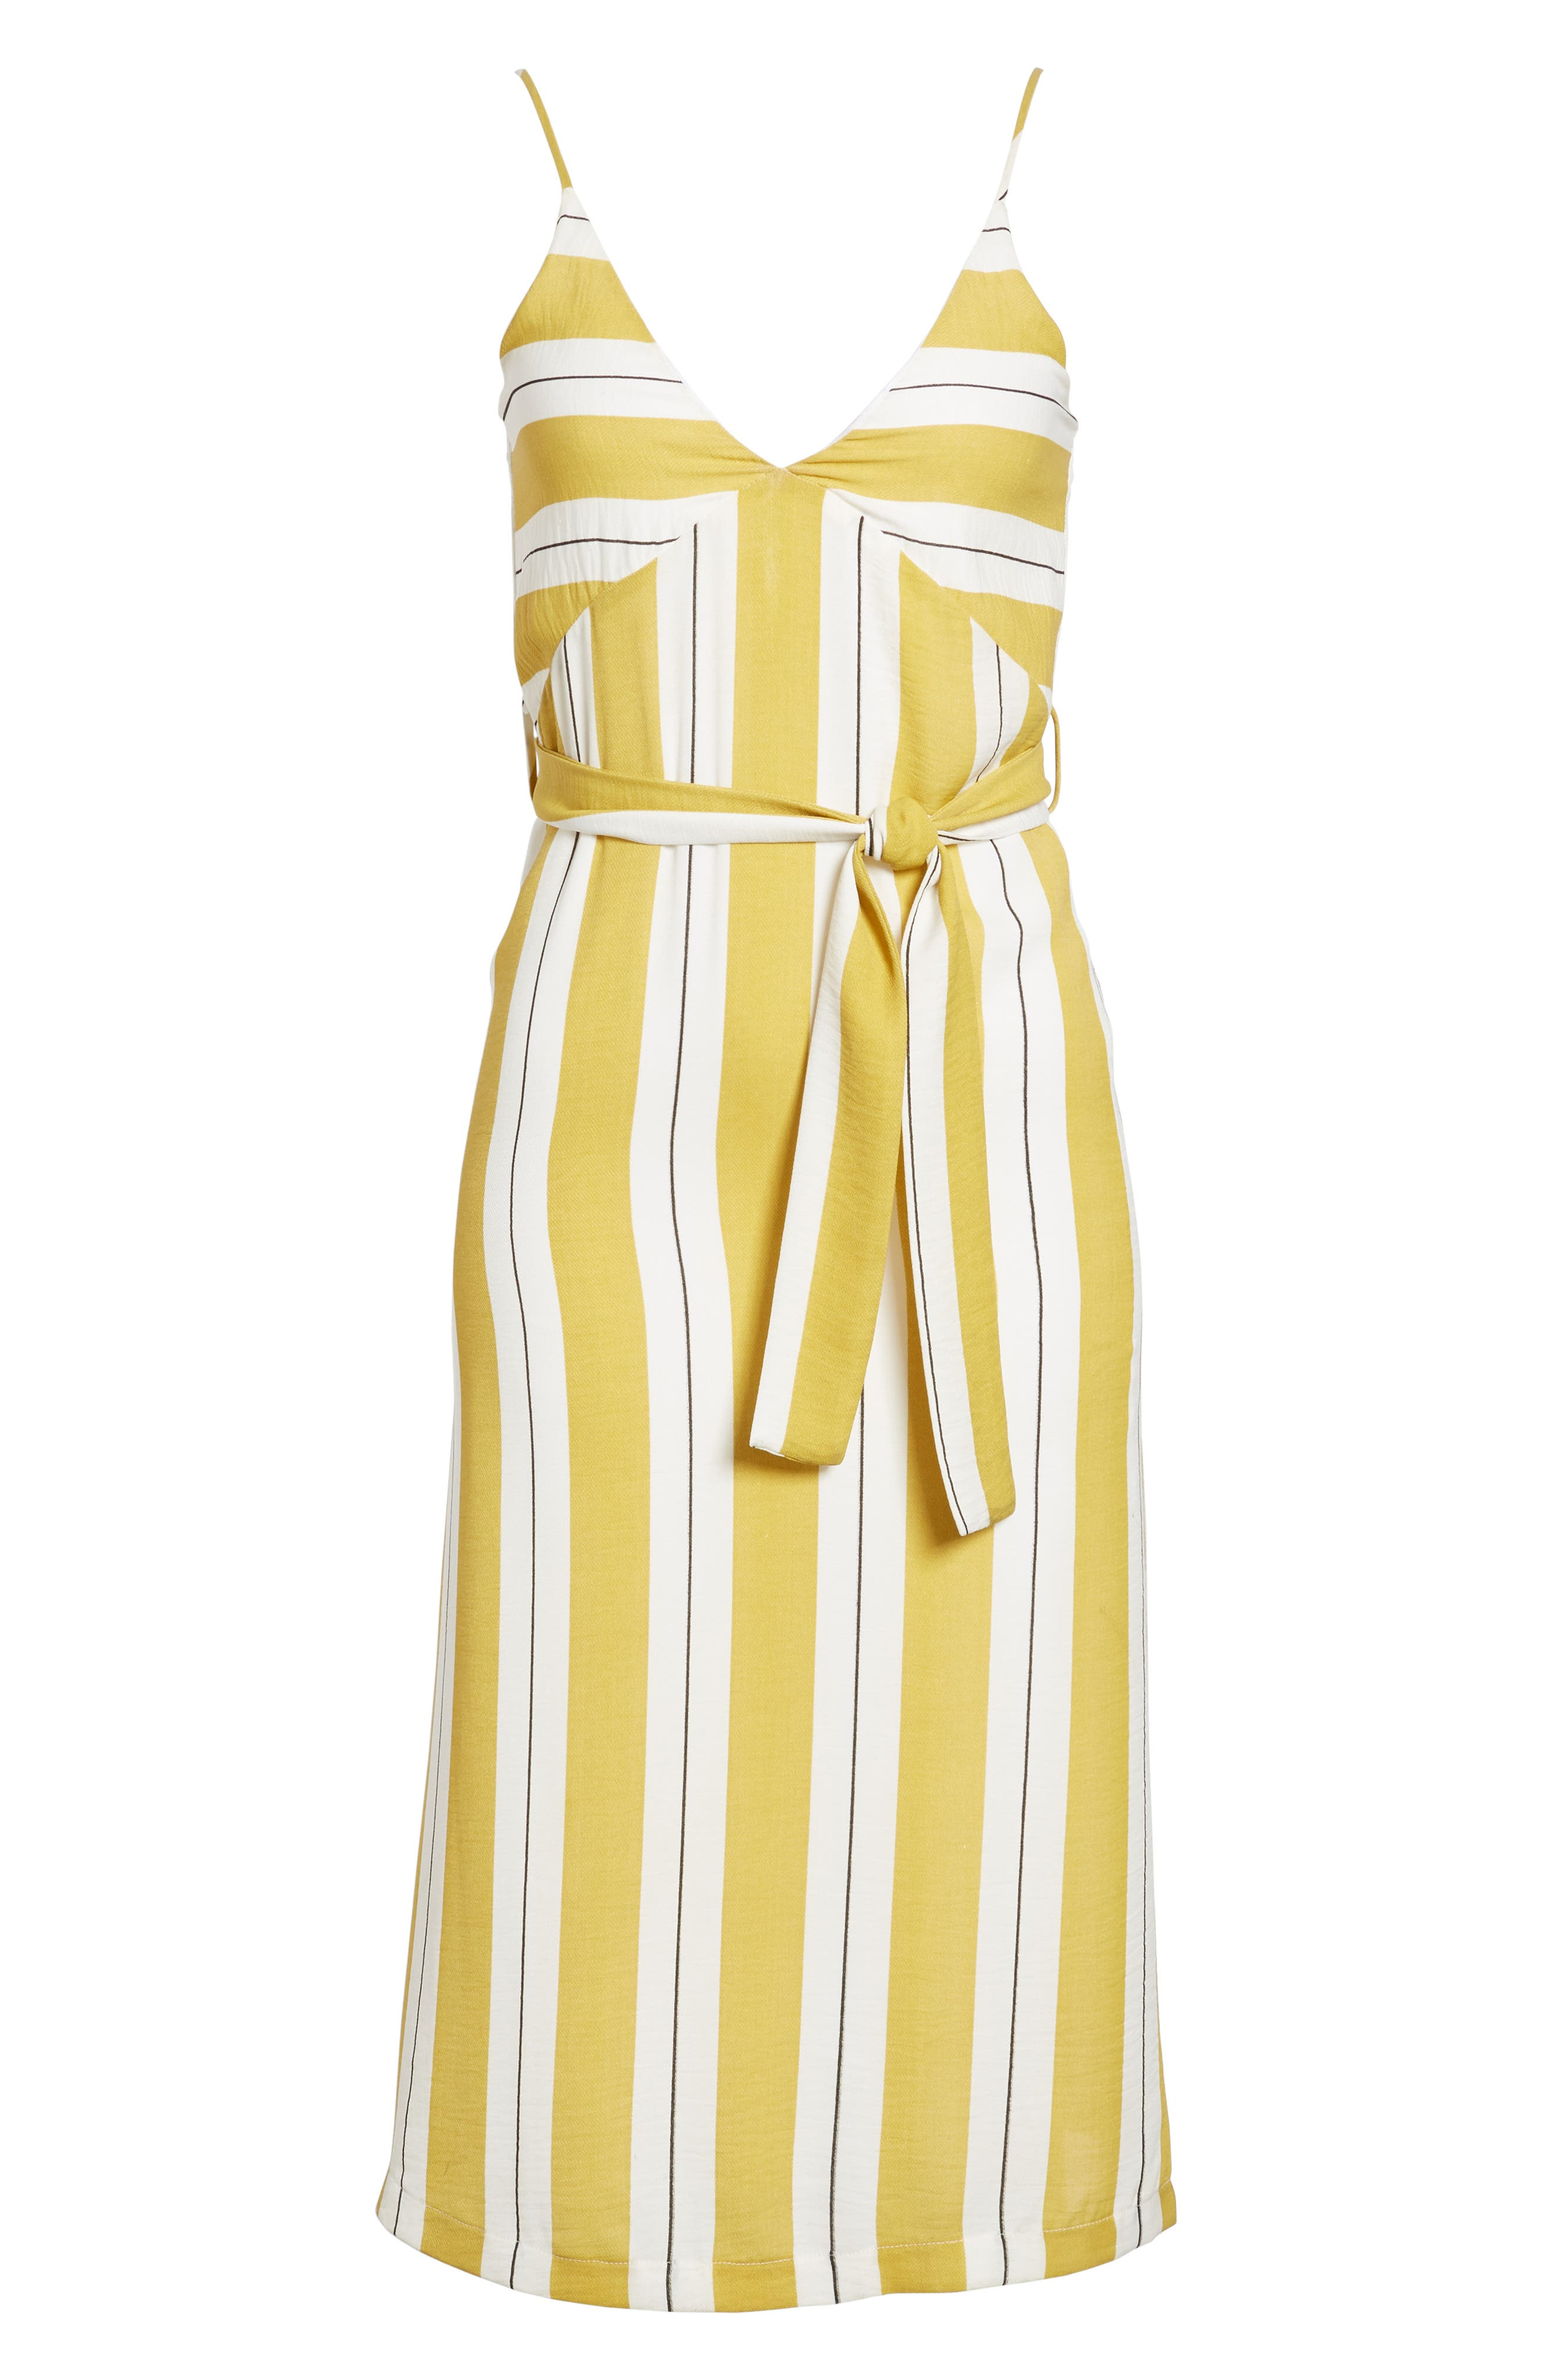 Stripe Midi Dress,                             Alternate thumbnail 8, color,                             Yellow Stripe Per Sample